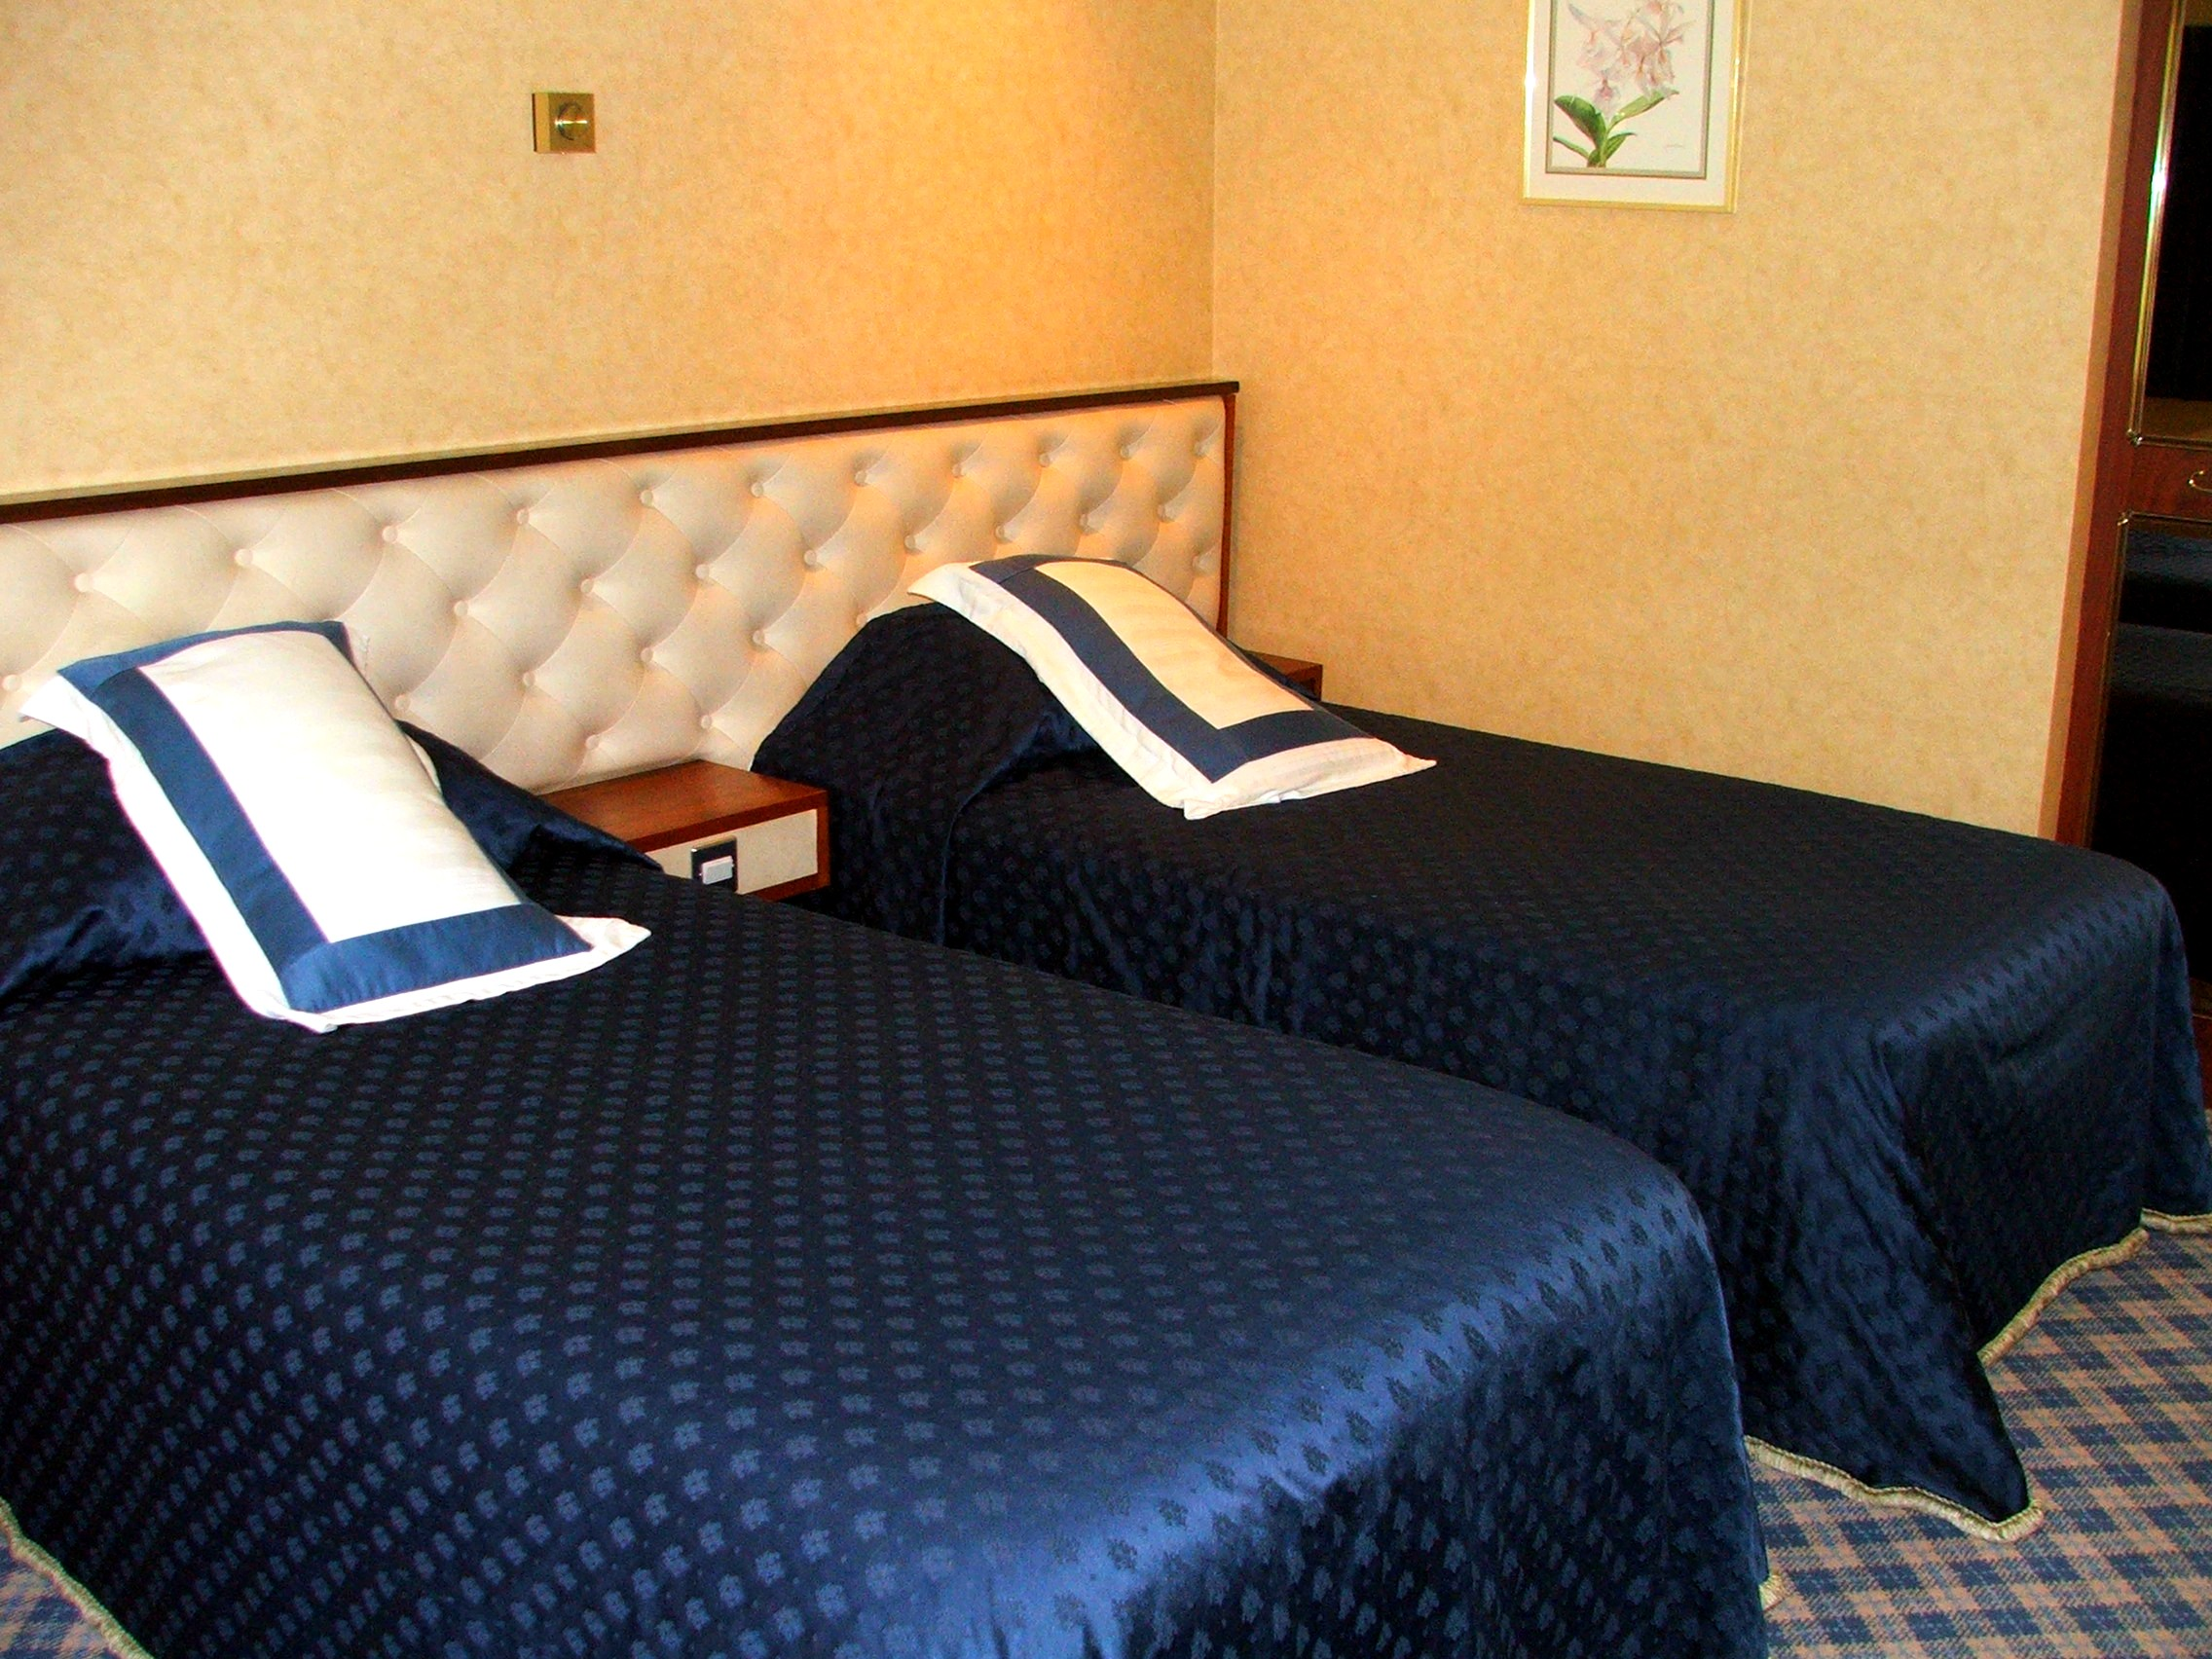 Powfoulis Hotel Bedroom twin